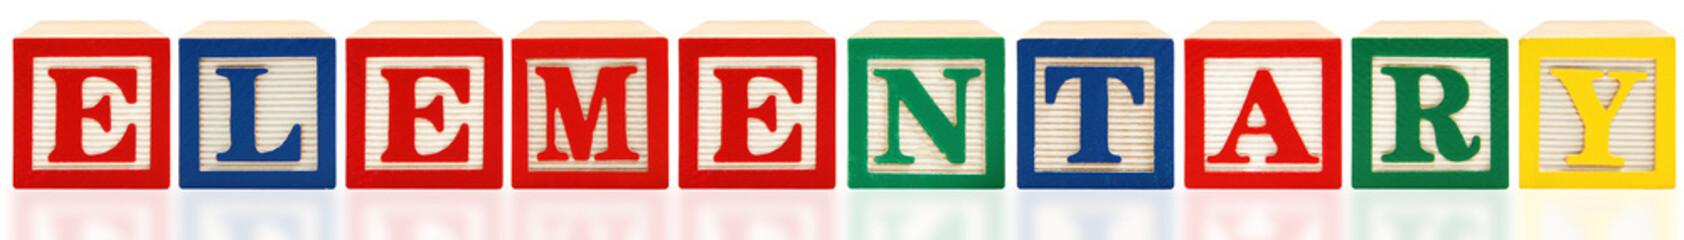 Alphabet Blocks Elementary